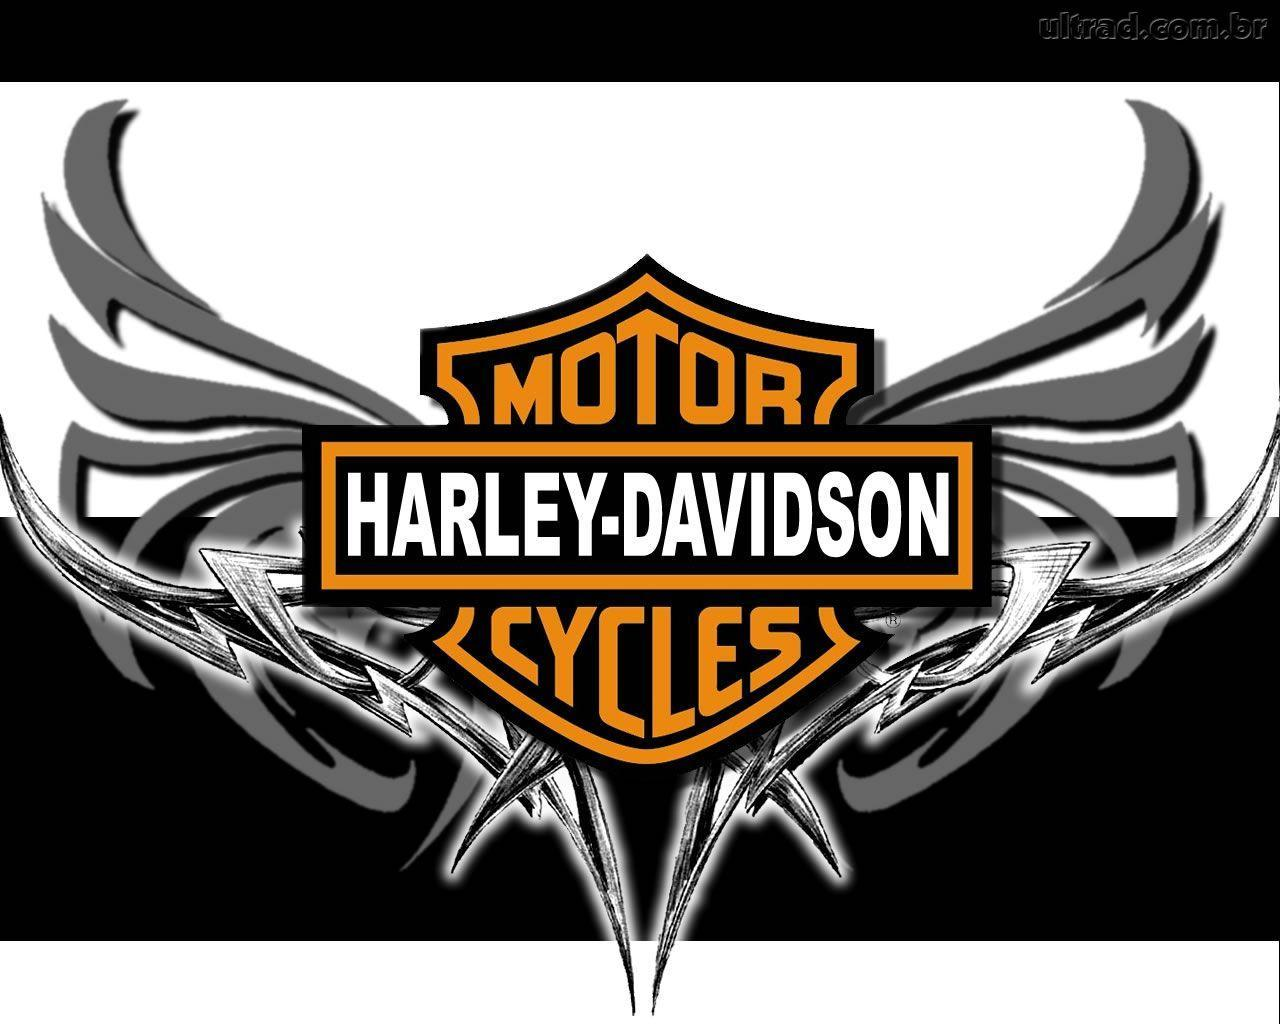 harley davidson logo wallpapers wallpaper cave harley davidson logo wallpaper#wallpaper tag harley davidson logo wallpaper iphone